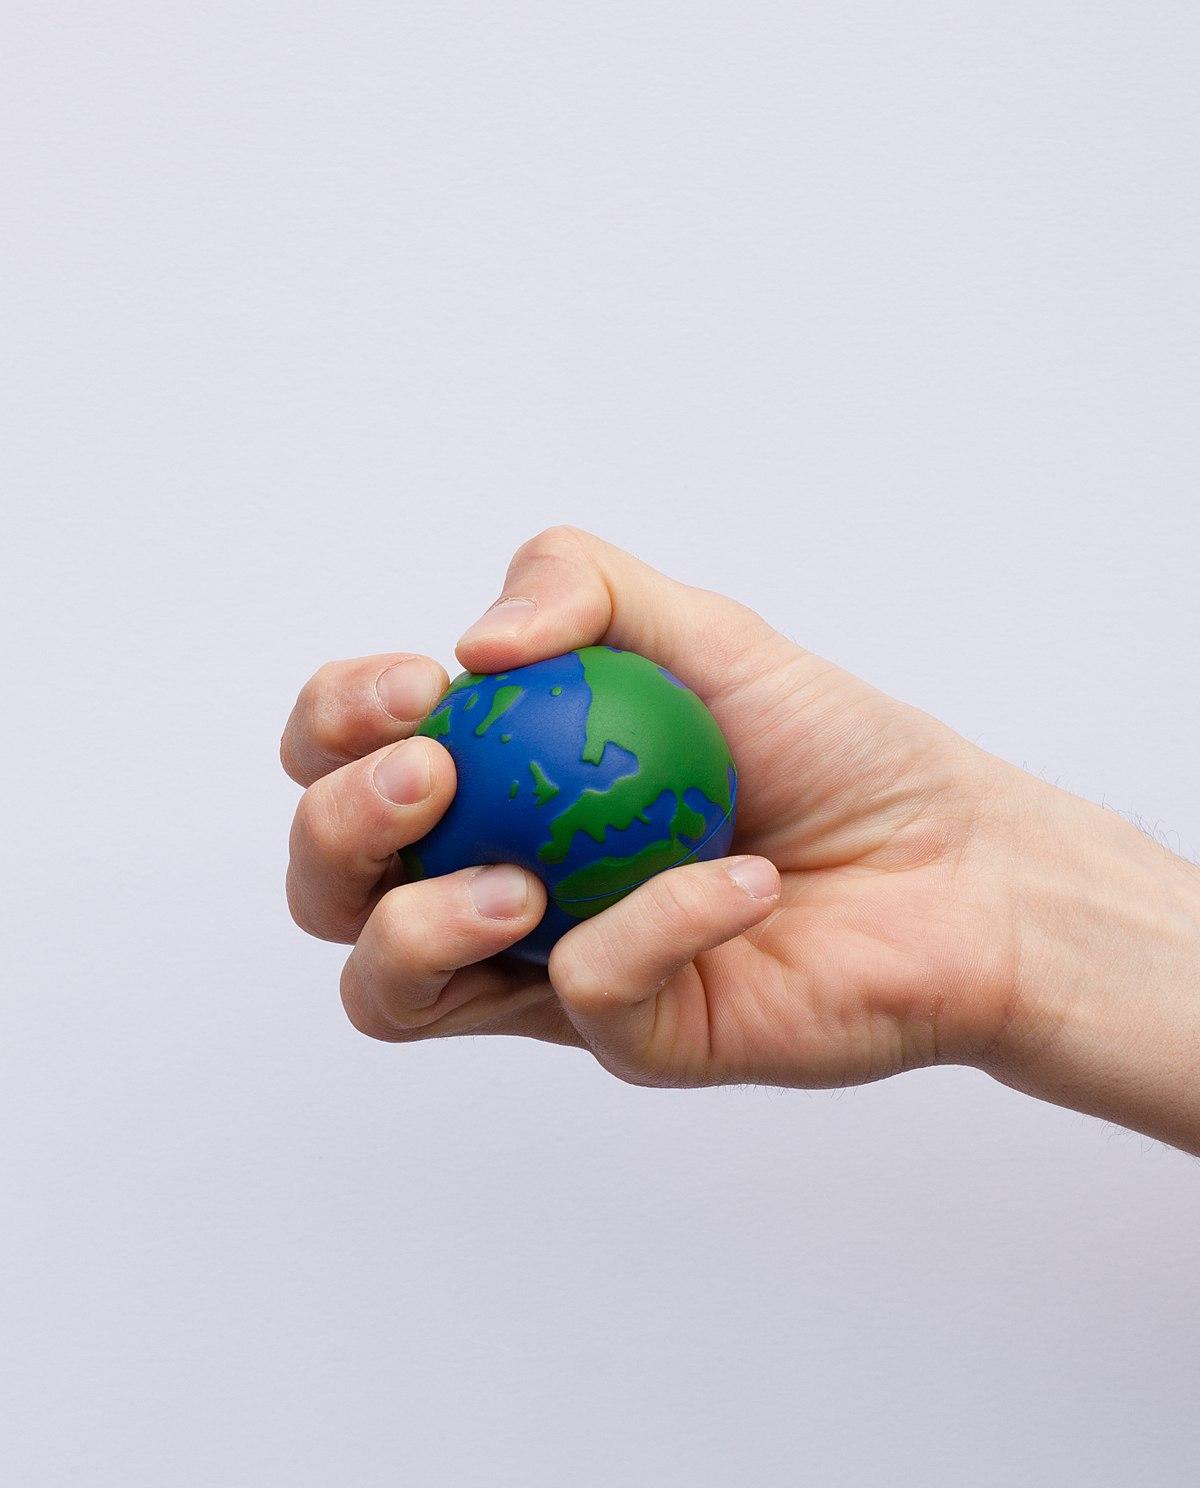 1200px-Earth_globe_stress_ball.jpg